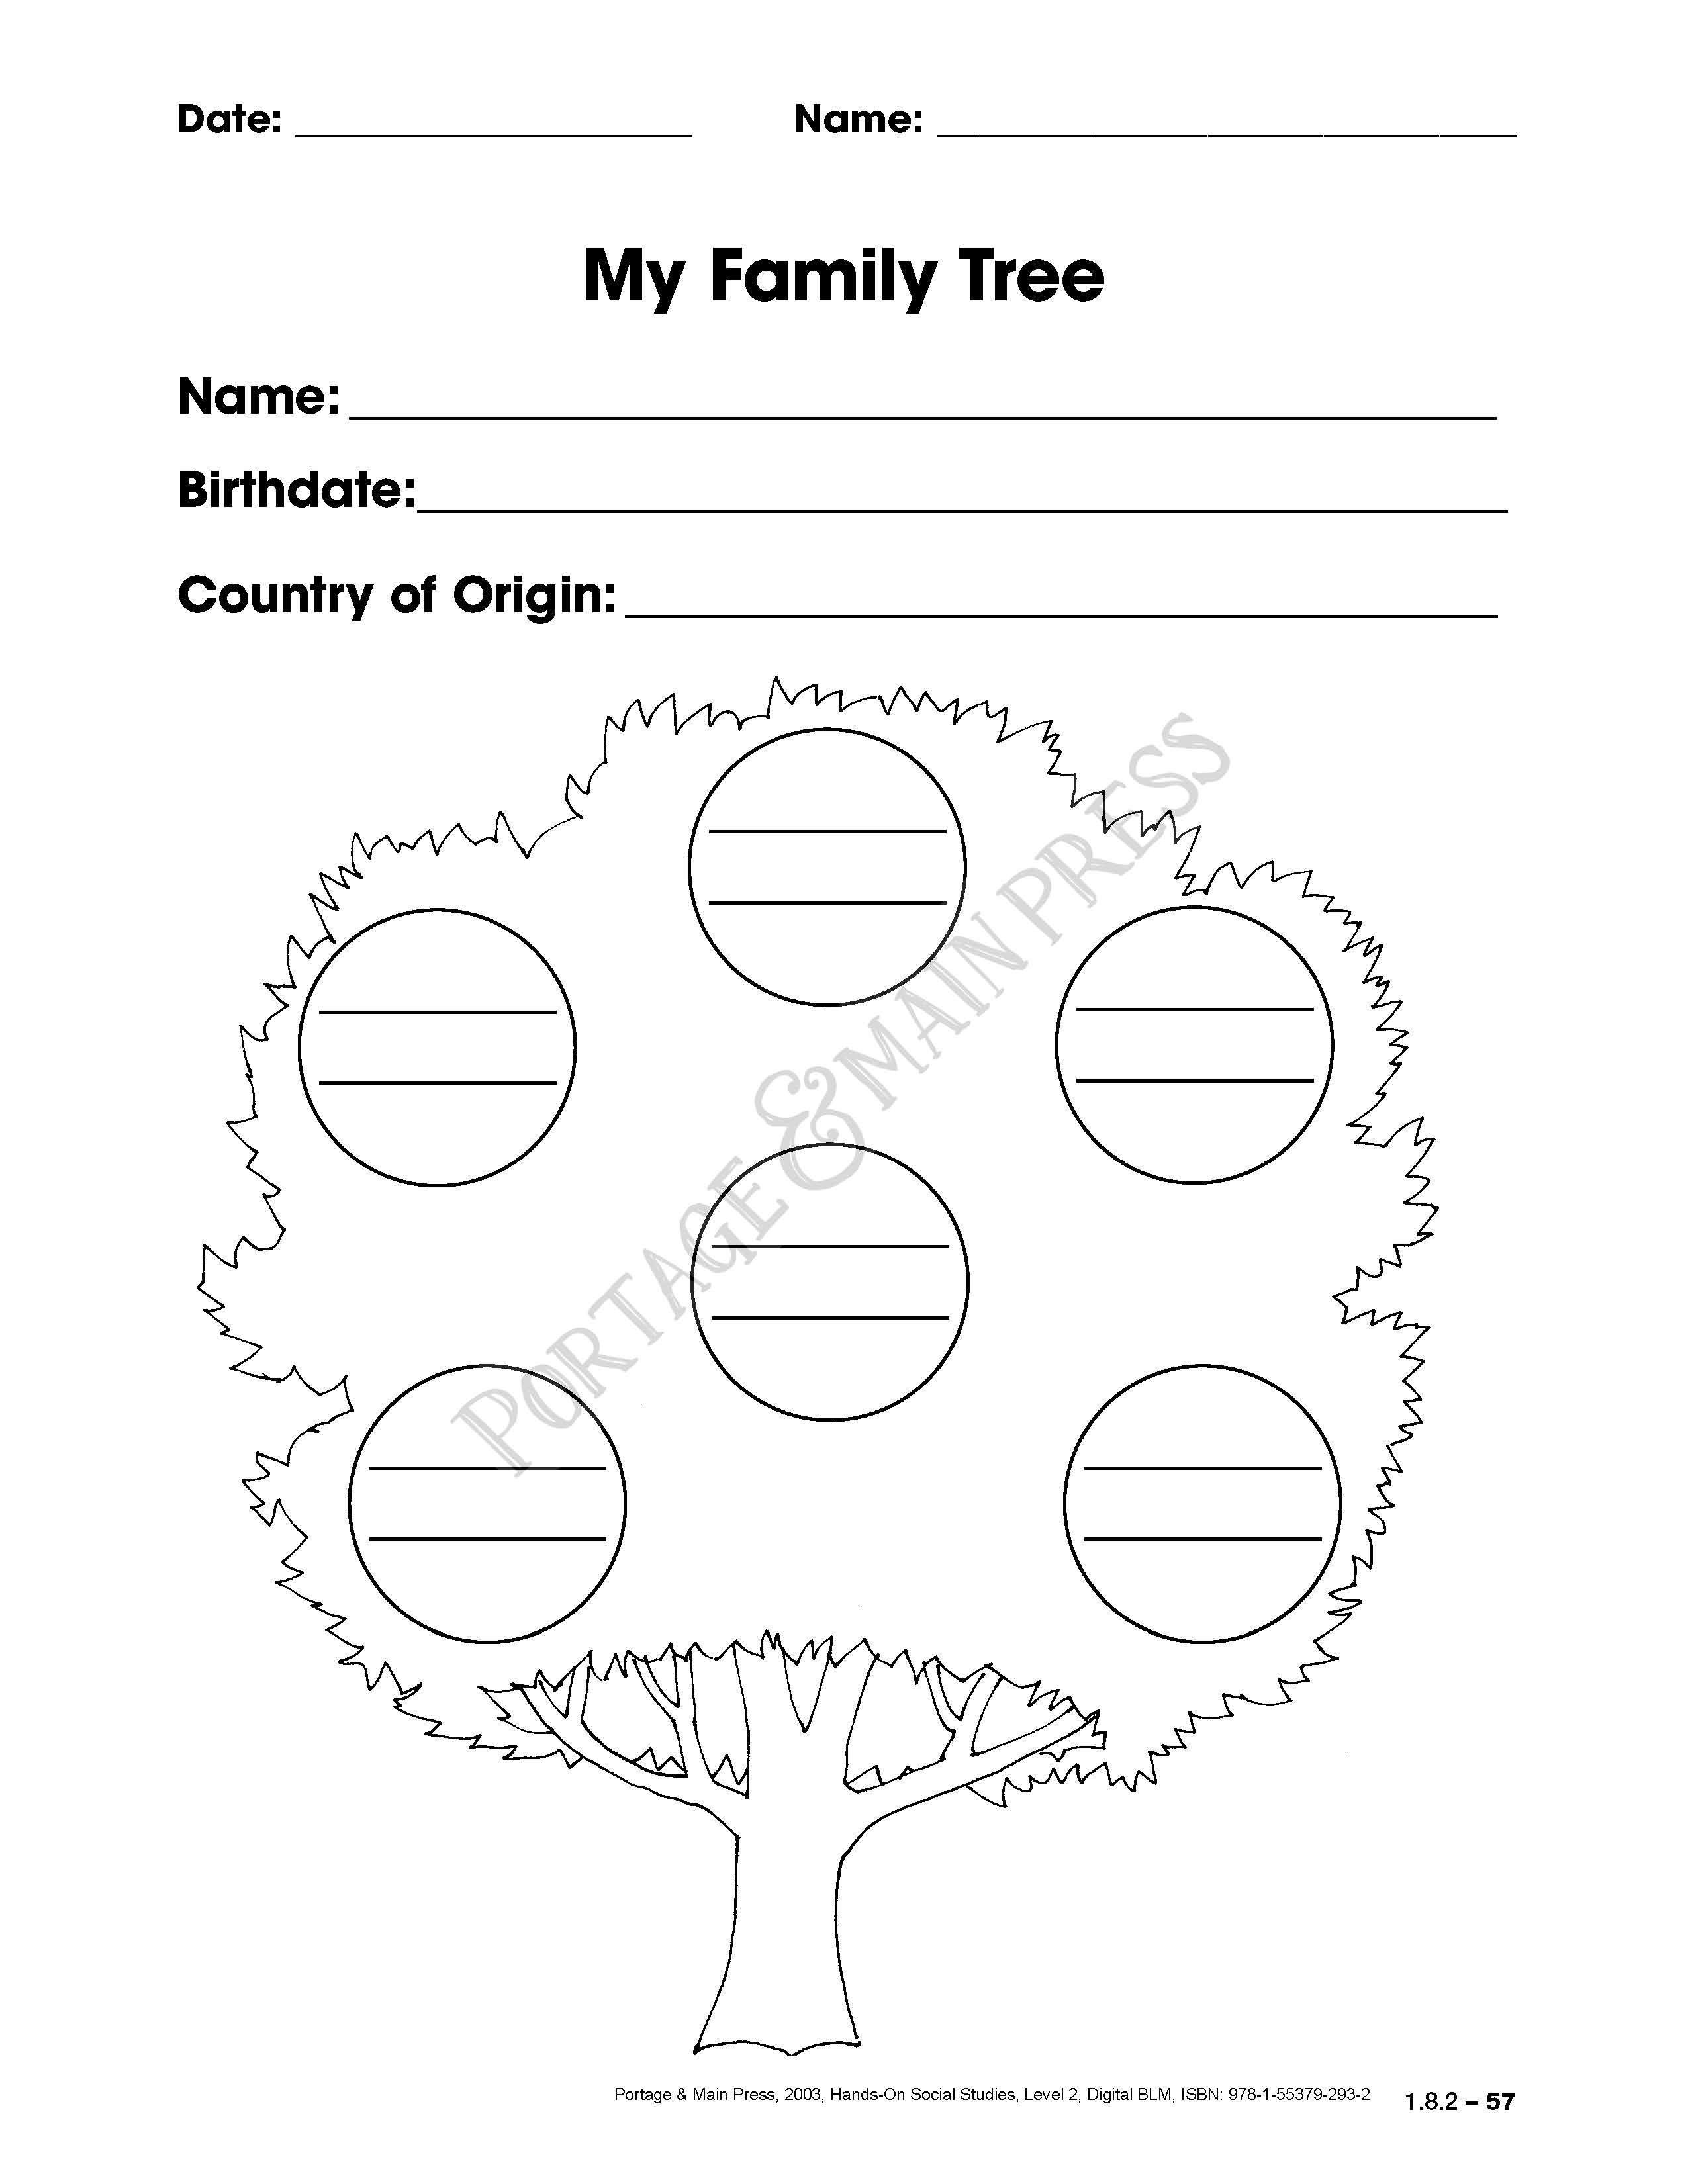 Grade 2 Social Studies Family Tree activity sheet